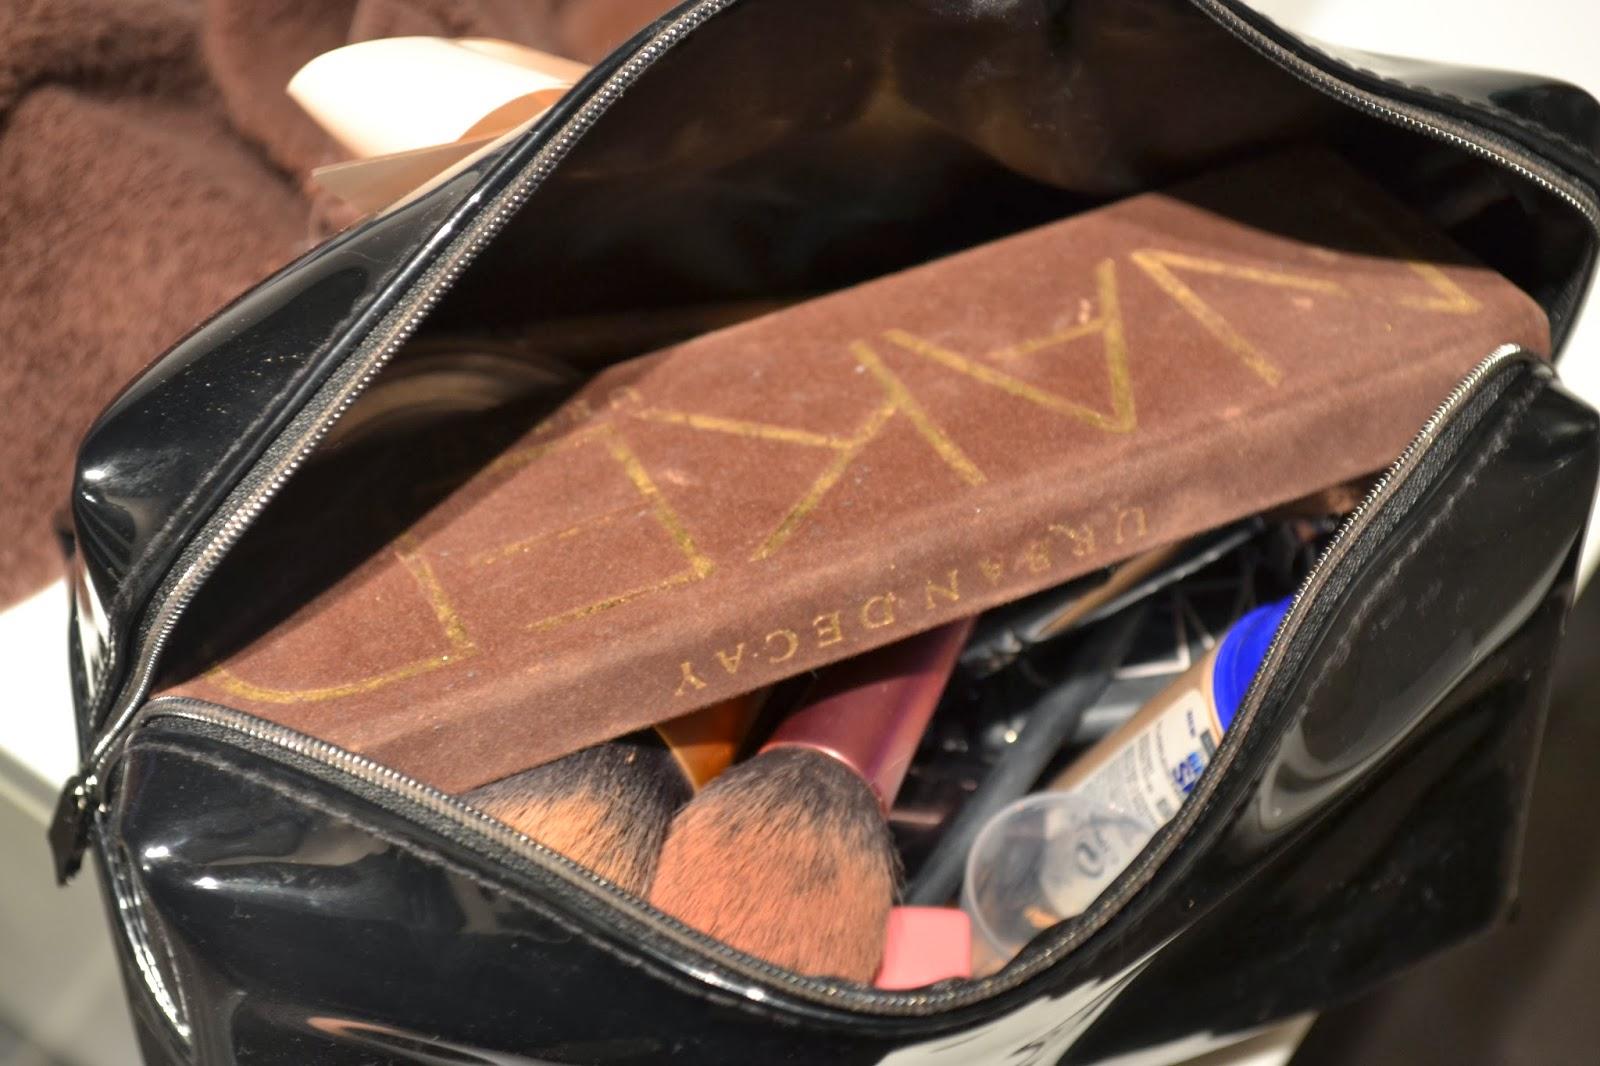 84b9086106b Storage | Ted Baker Large Bow Makeup Bag - Girl Up North